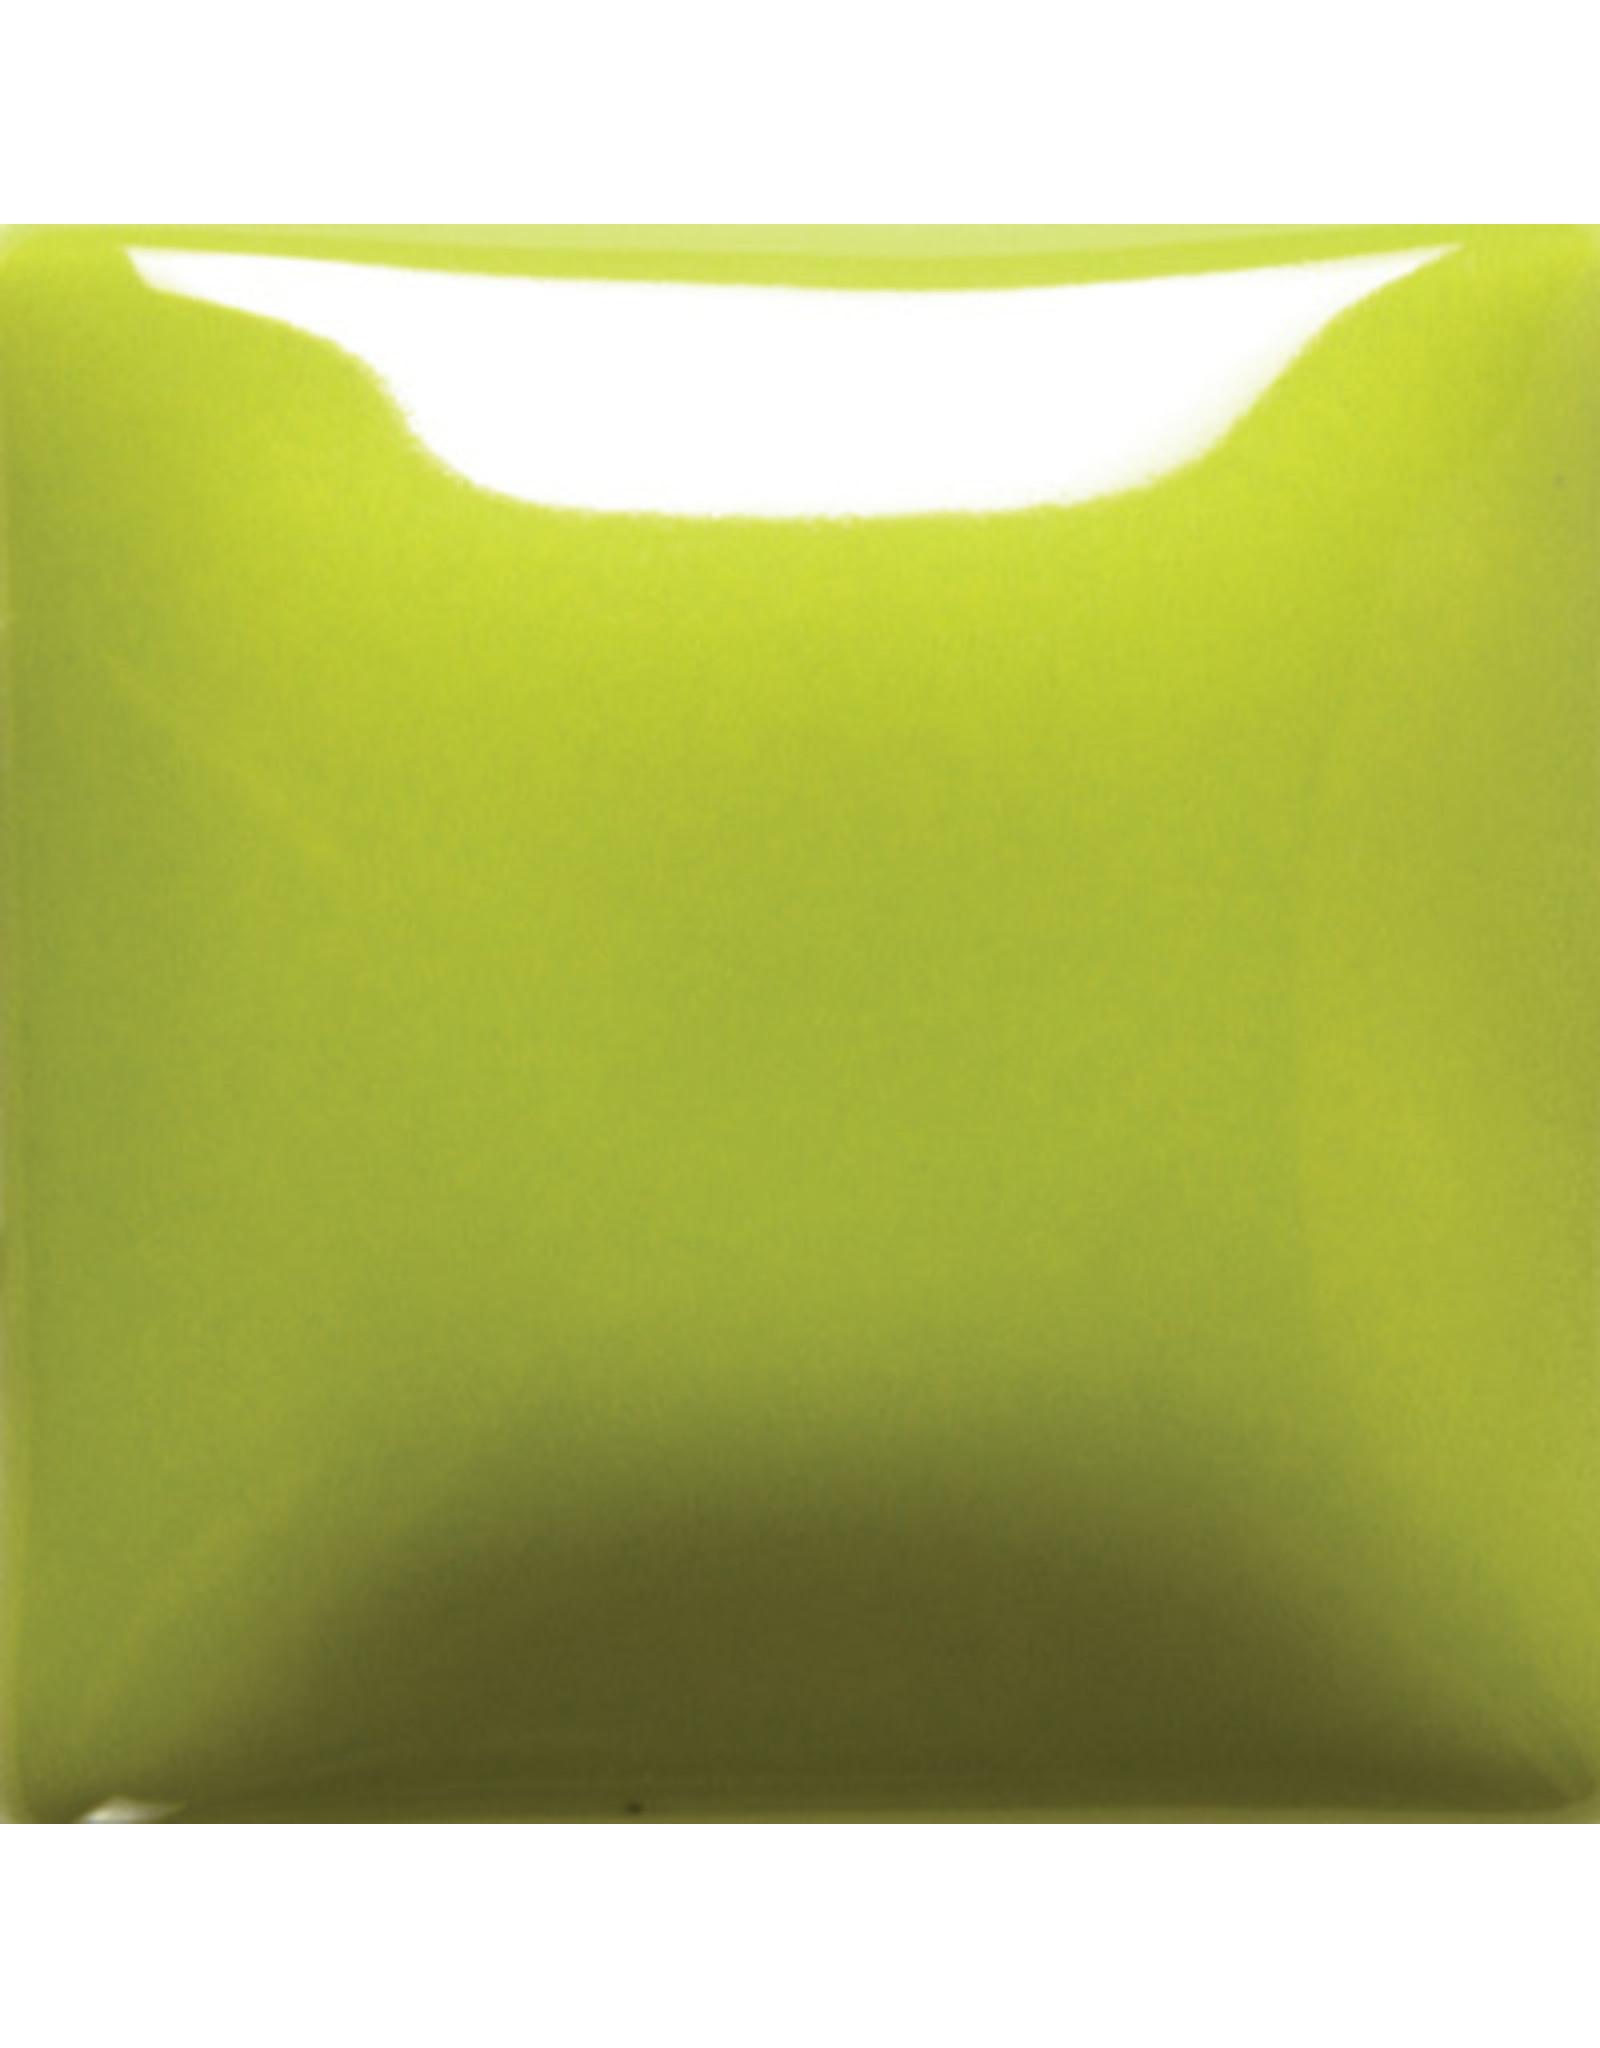 Mayco Mayco Foundations Chartreuse 473ml